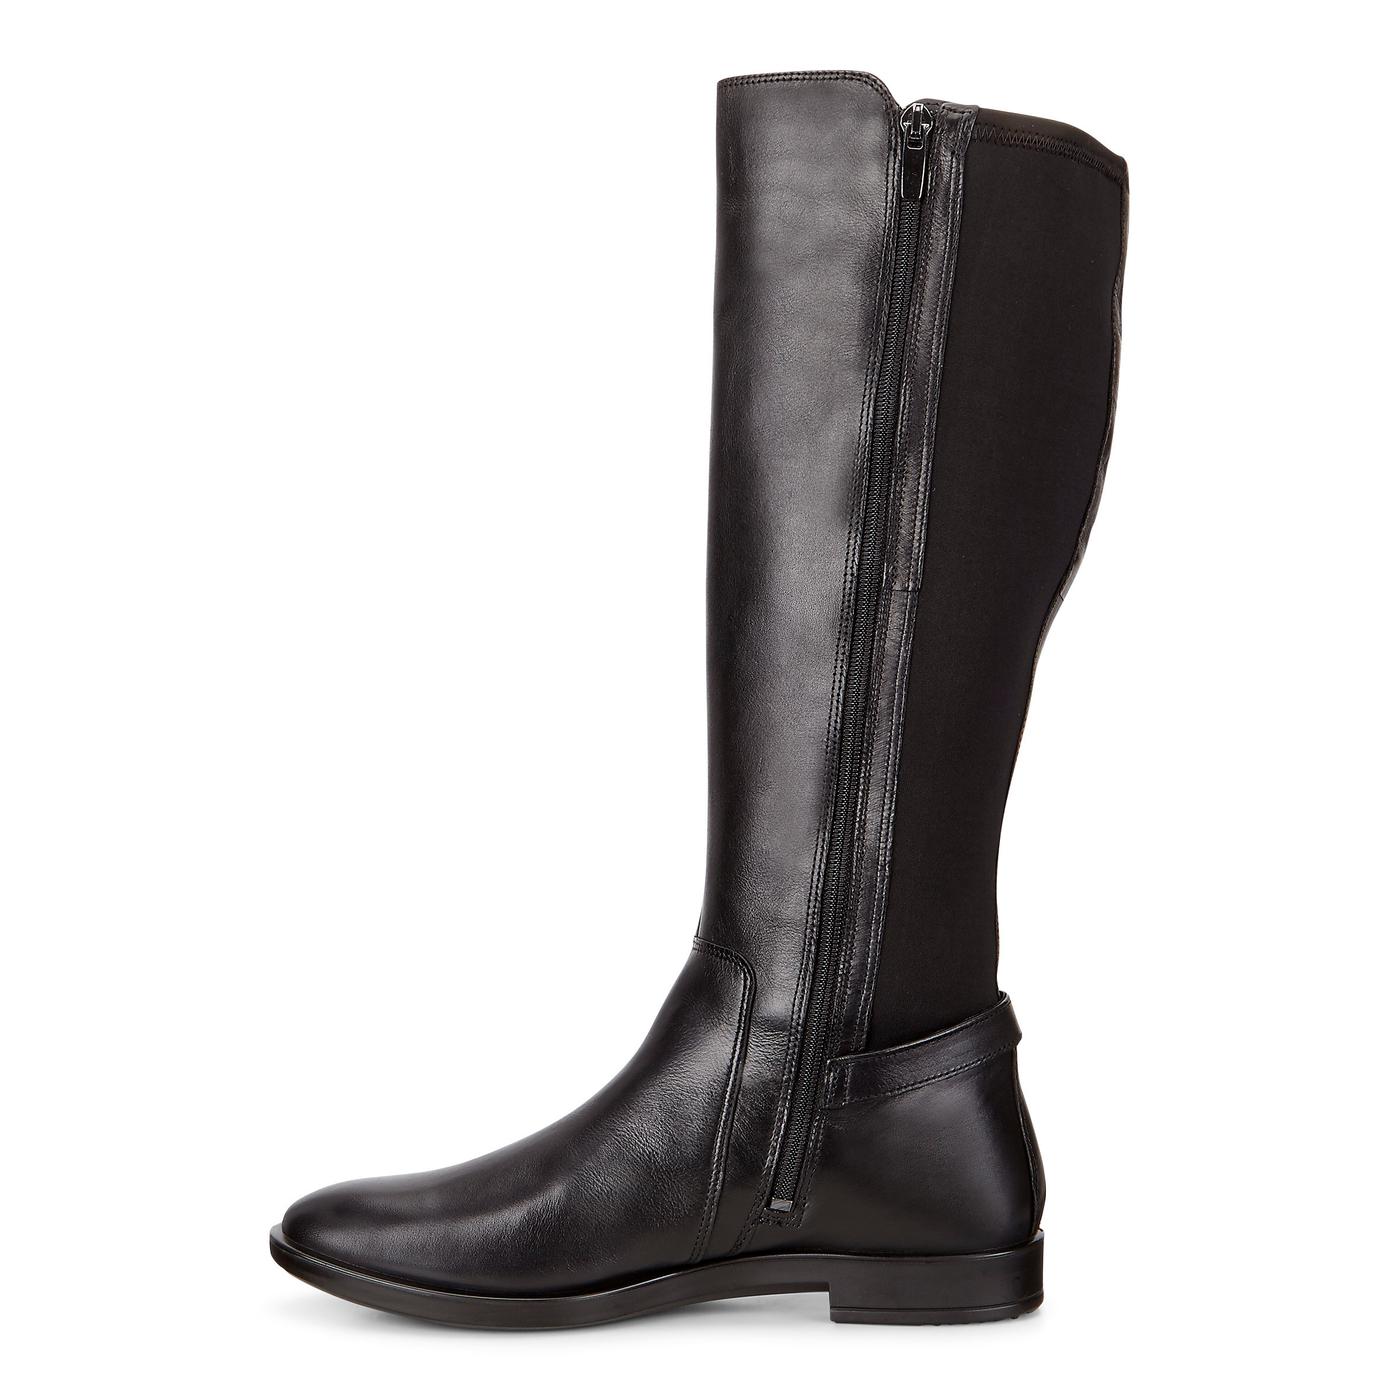 ECCO SHAPE M Jockey Boot 15mm